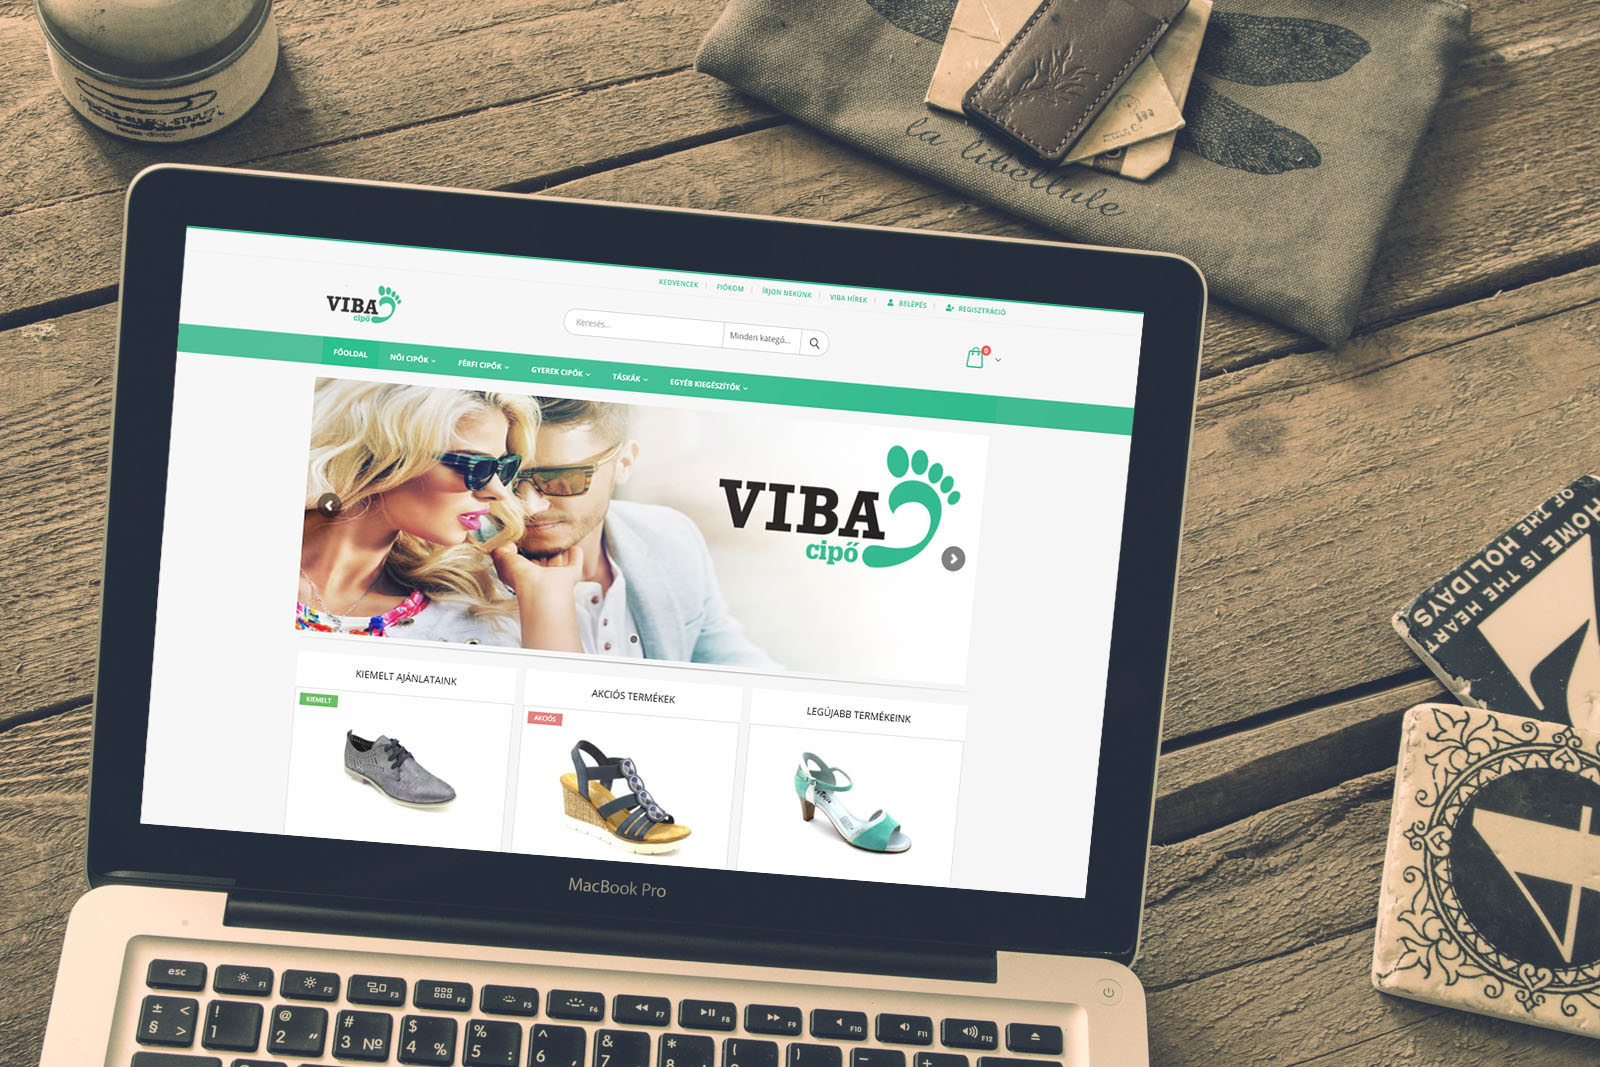 VIBA cipő Shop | Facebook